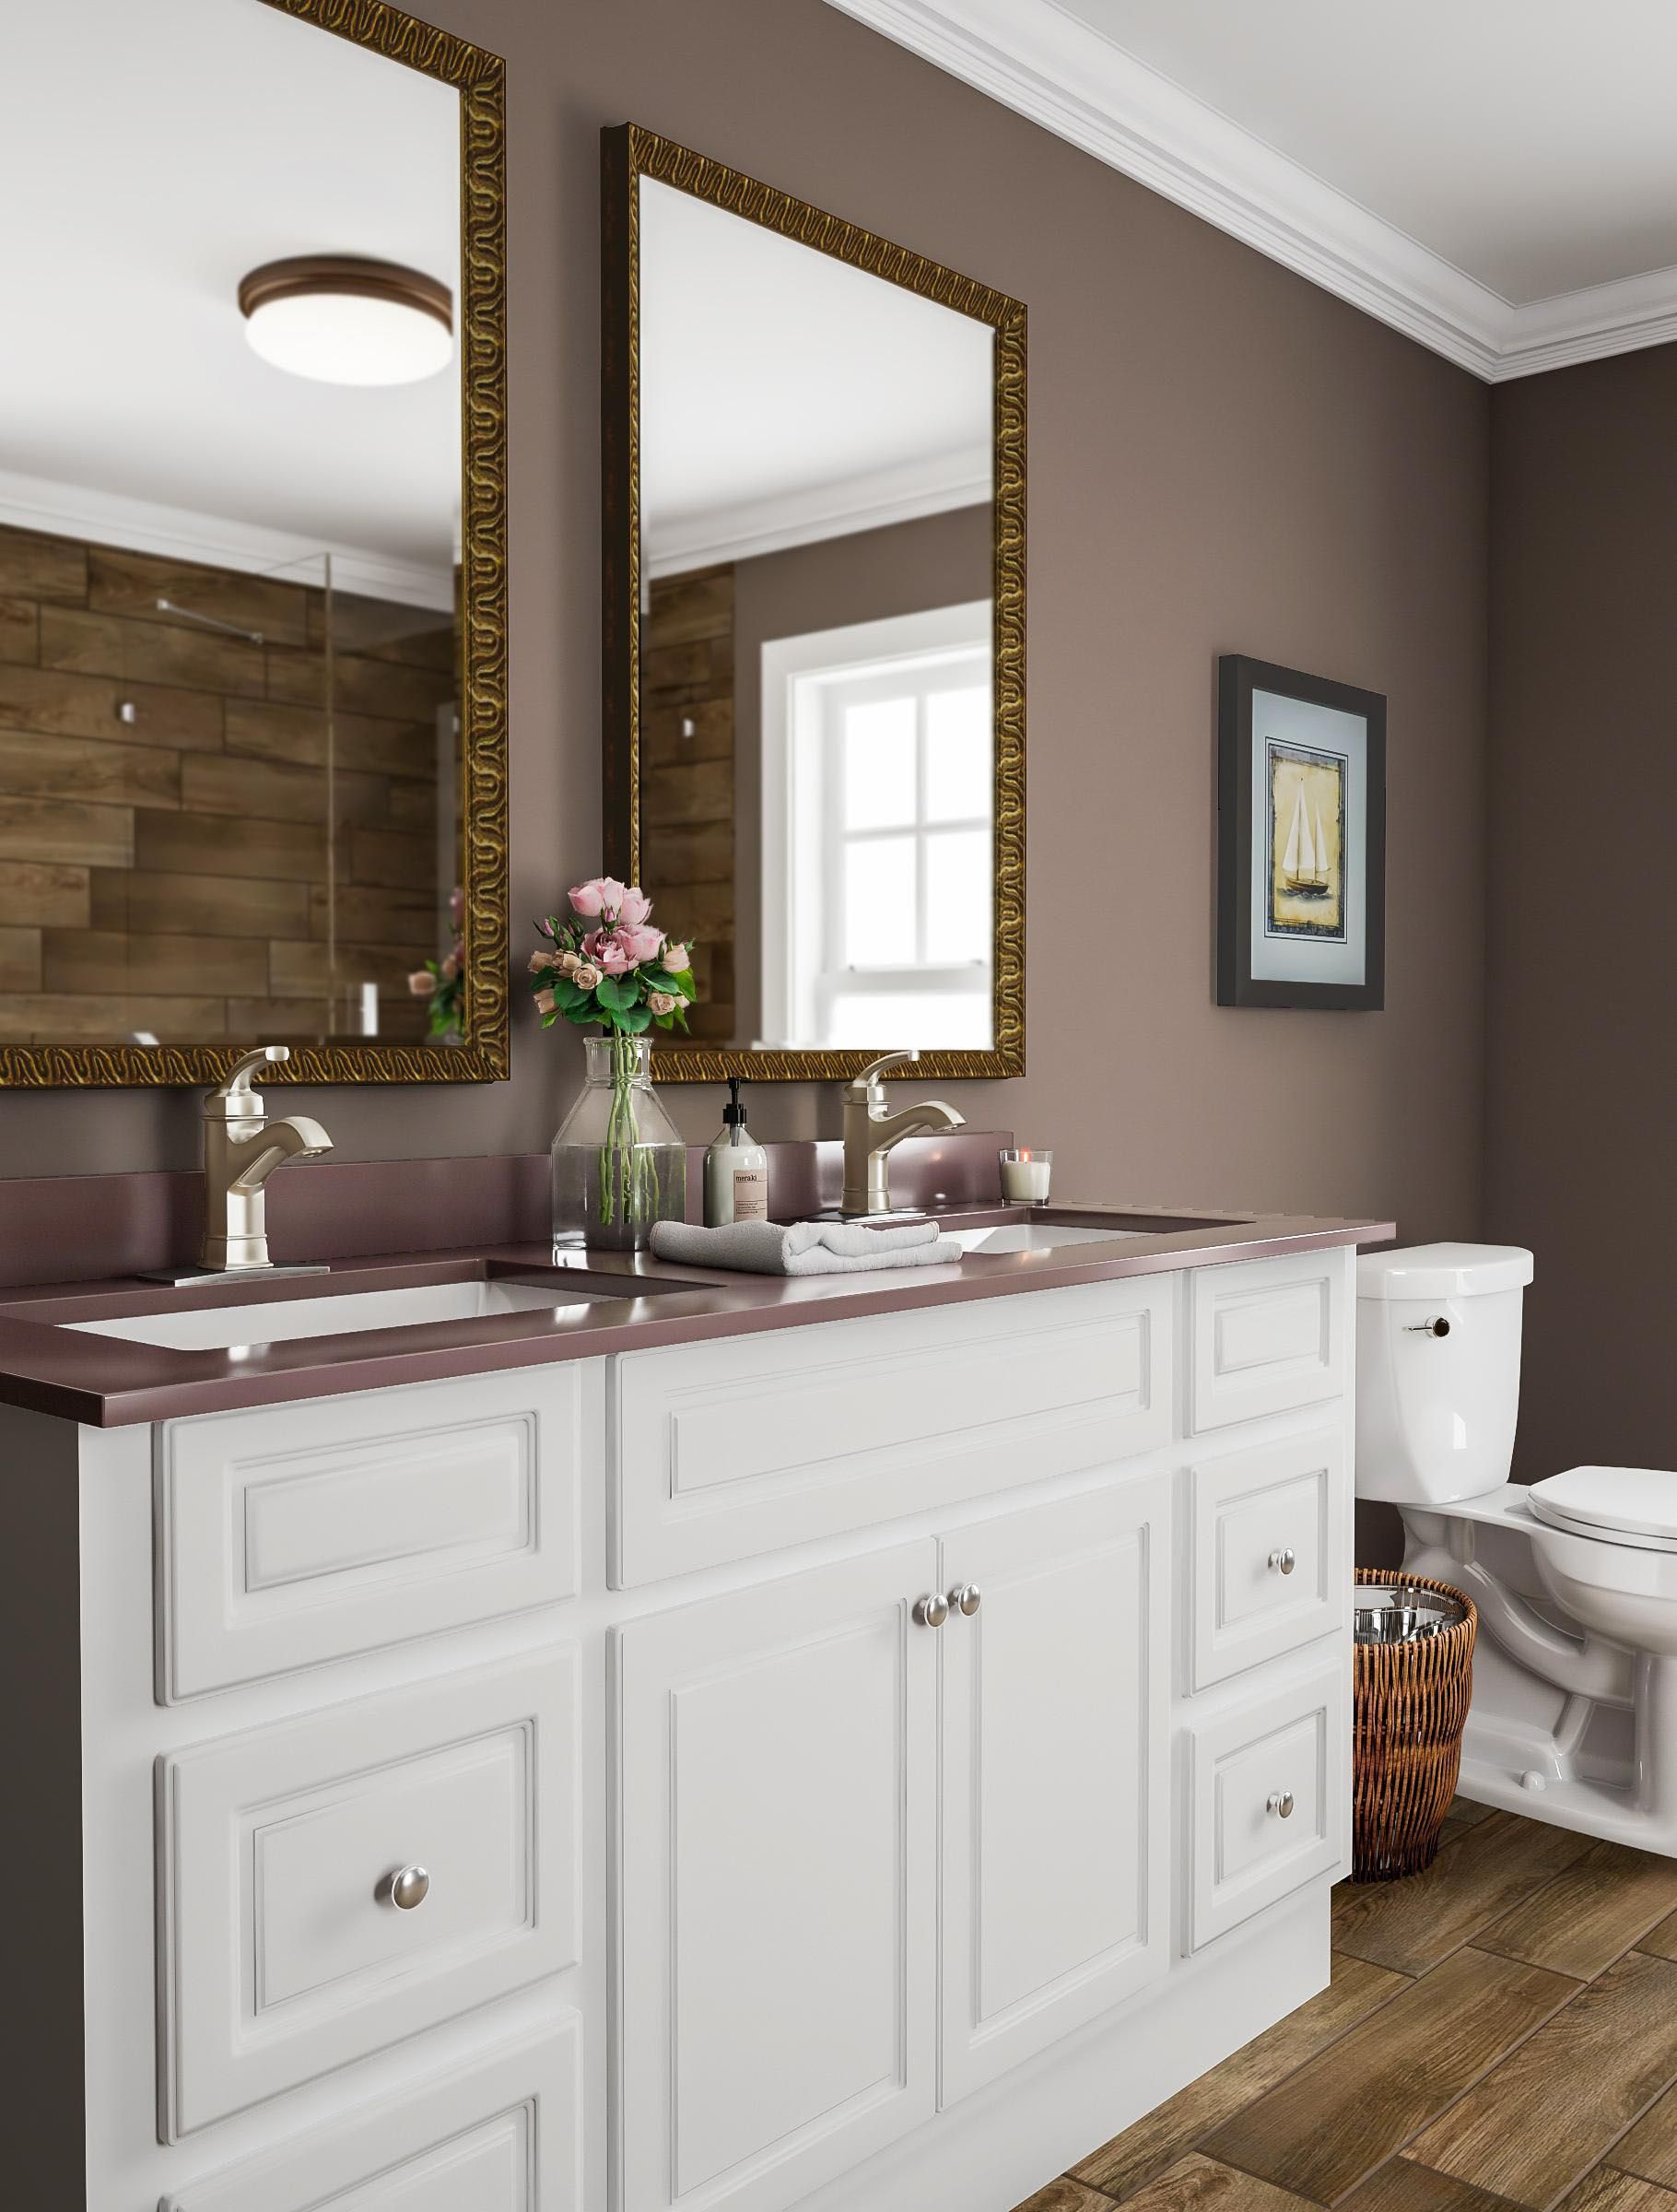 Small Bathroom Paint Color Ideas 2020 Trendecors